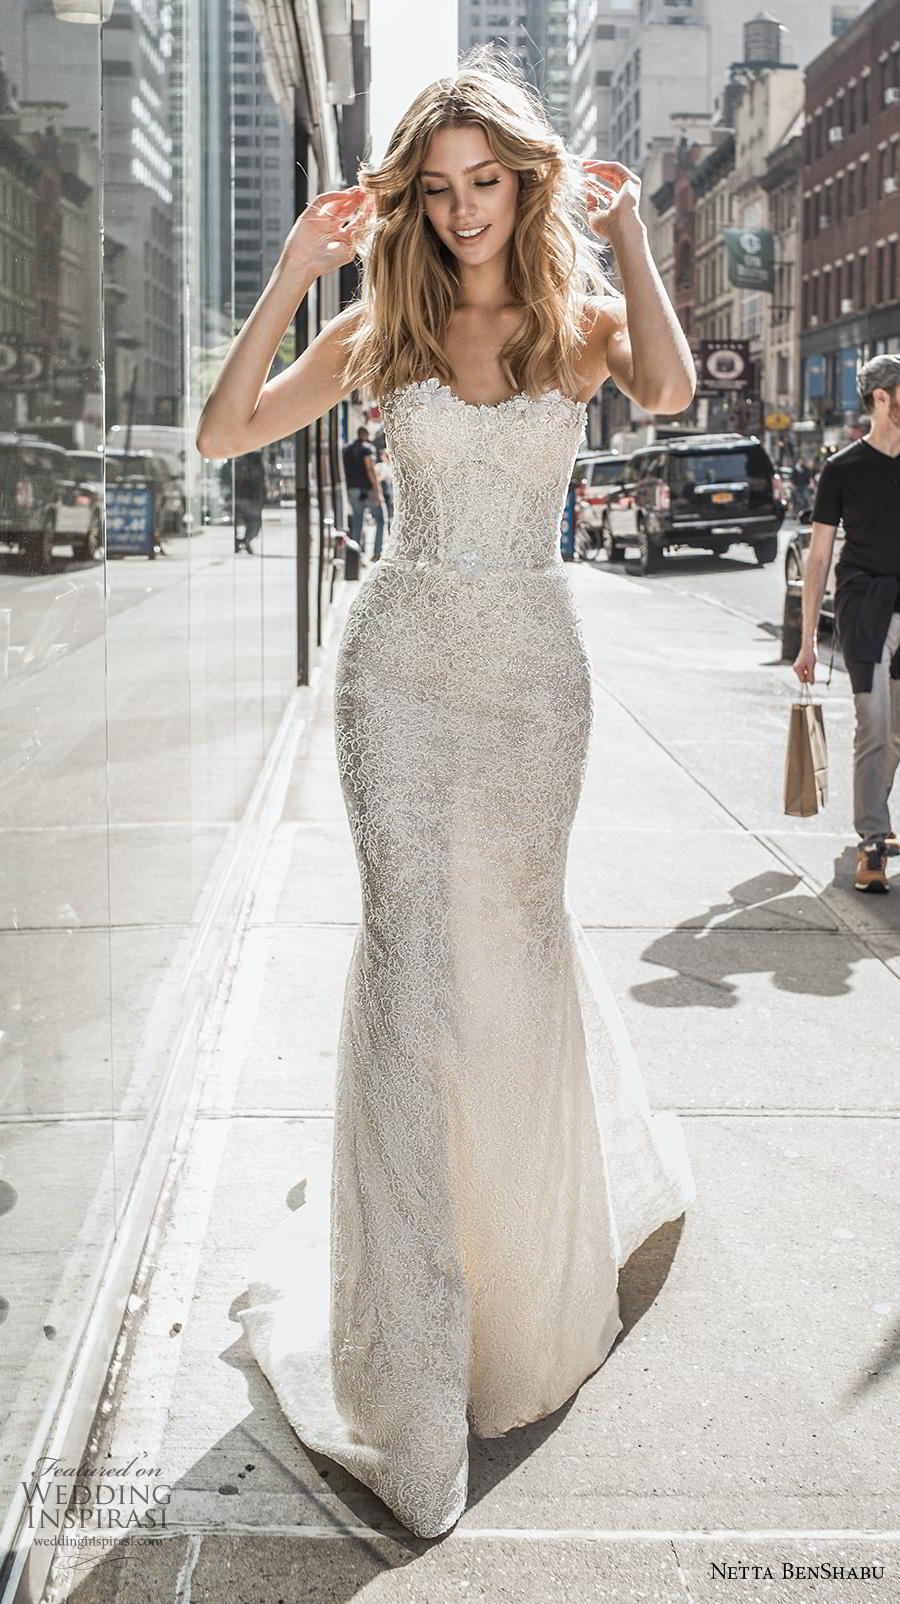 netta benshabu fall 2019 bridal strapless sweetheart neckline full embellishment bustier elegant fit and flare wedding dress mid back medium train (6) mv